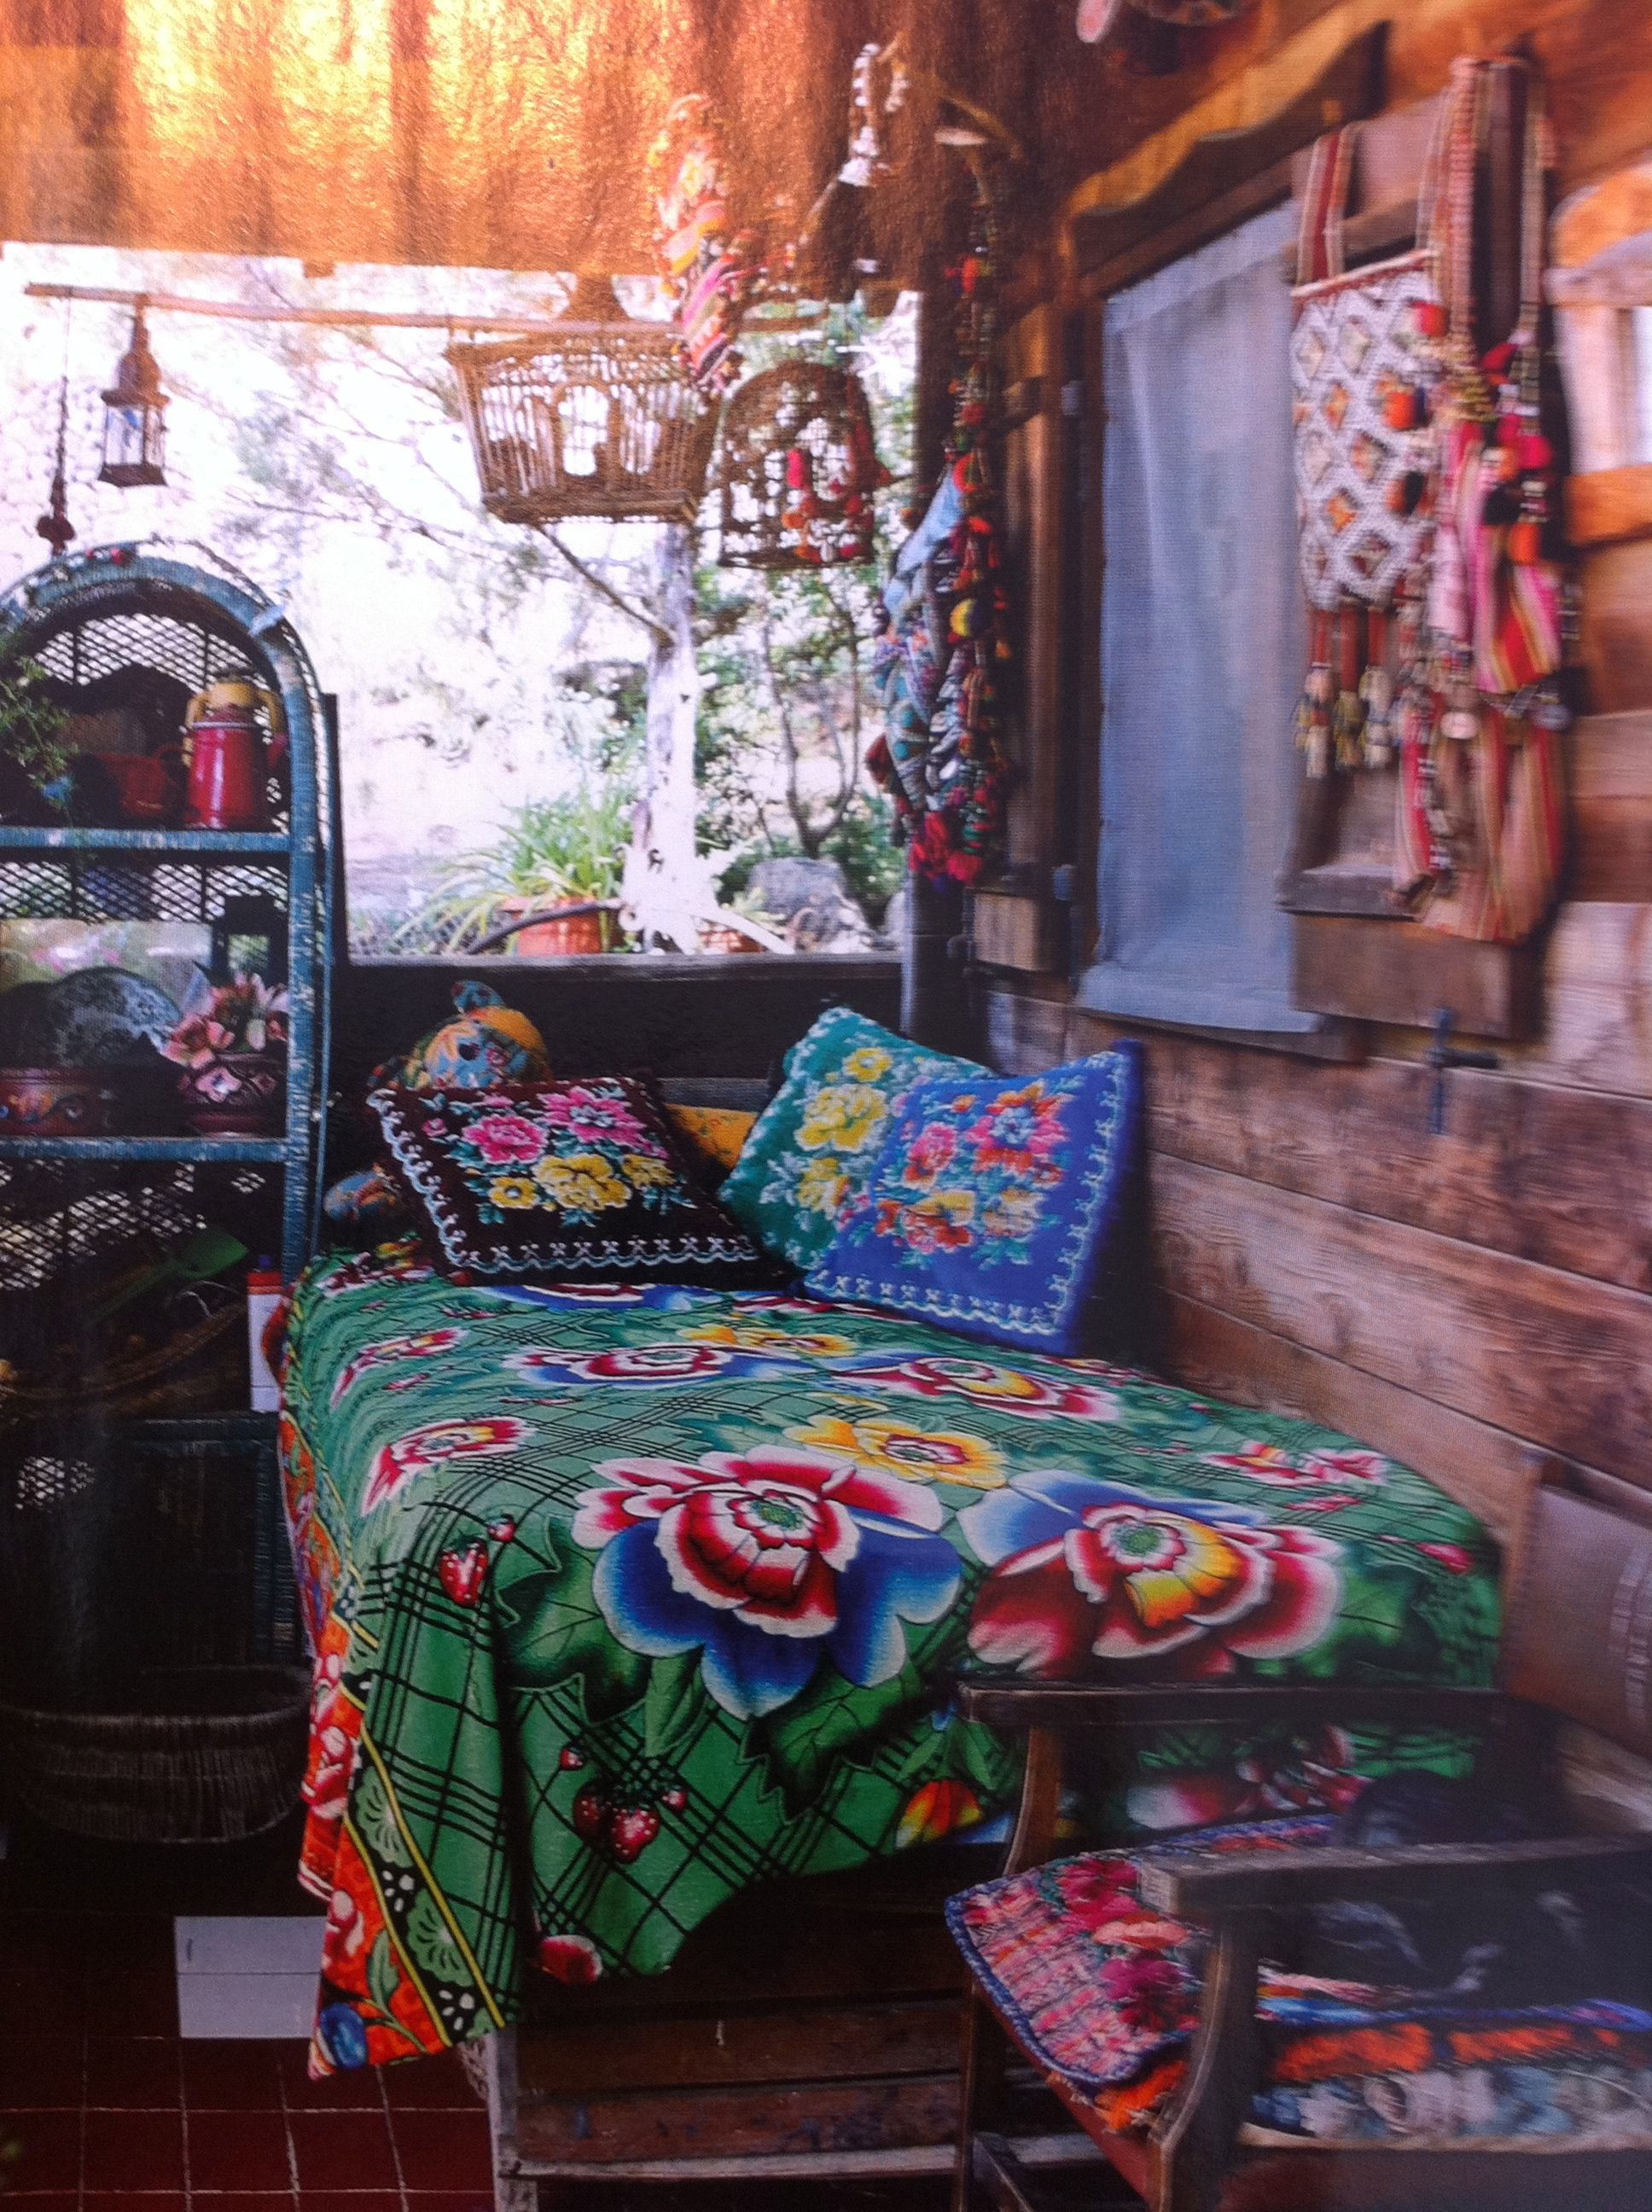 Gipsy ibiza style deco pinterest camas gitano y for Muebles gitanos